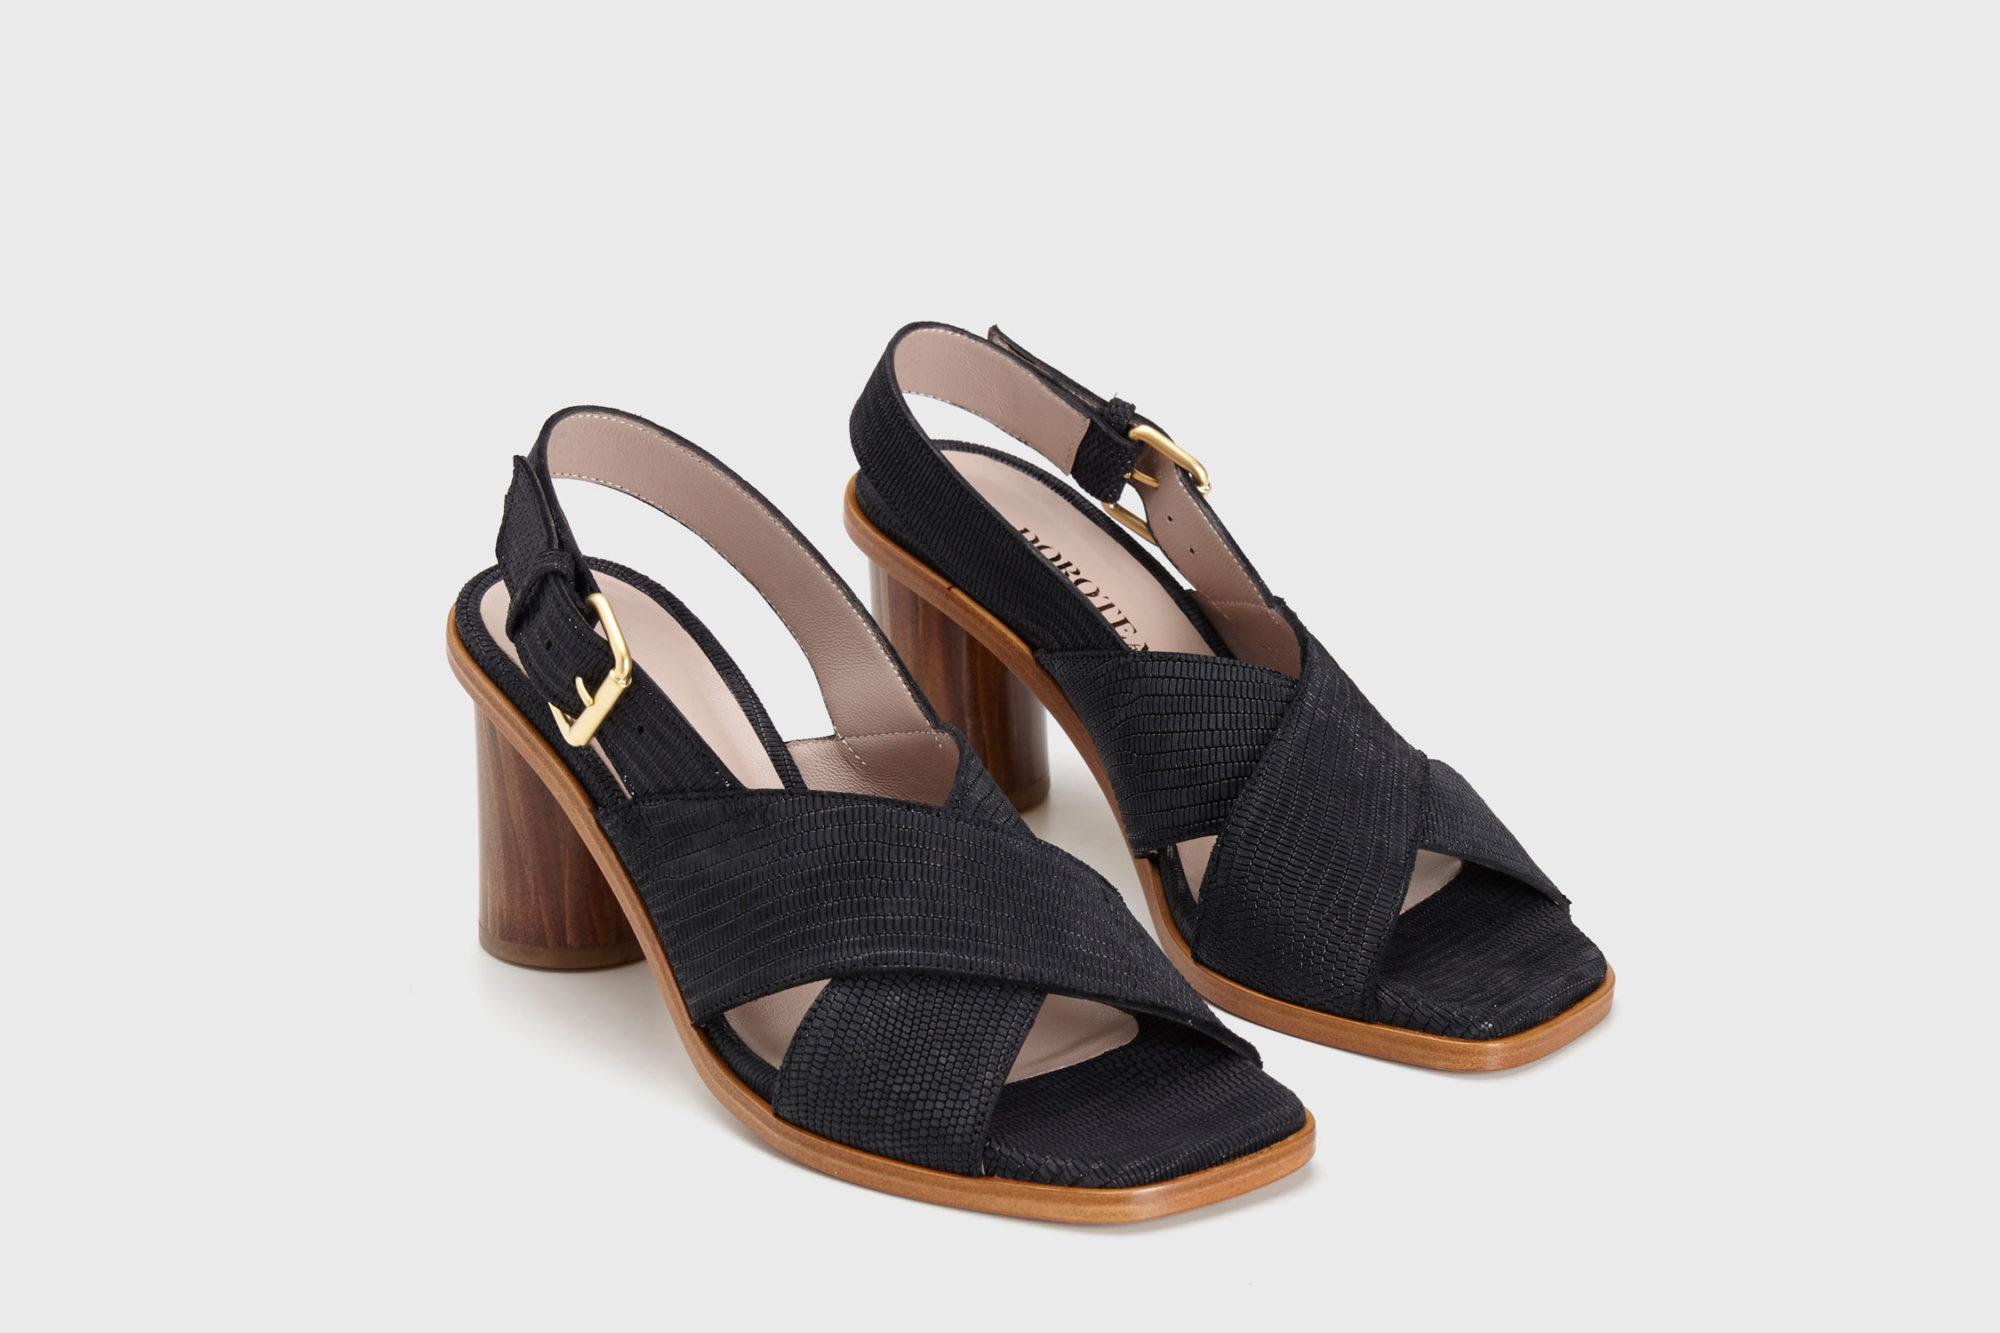 Dorotea sandalia de tacón alto jazz negra ss17 par